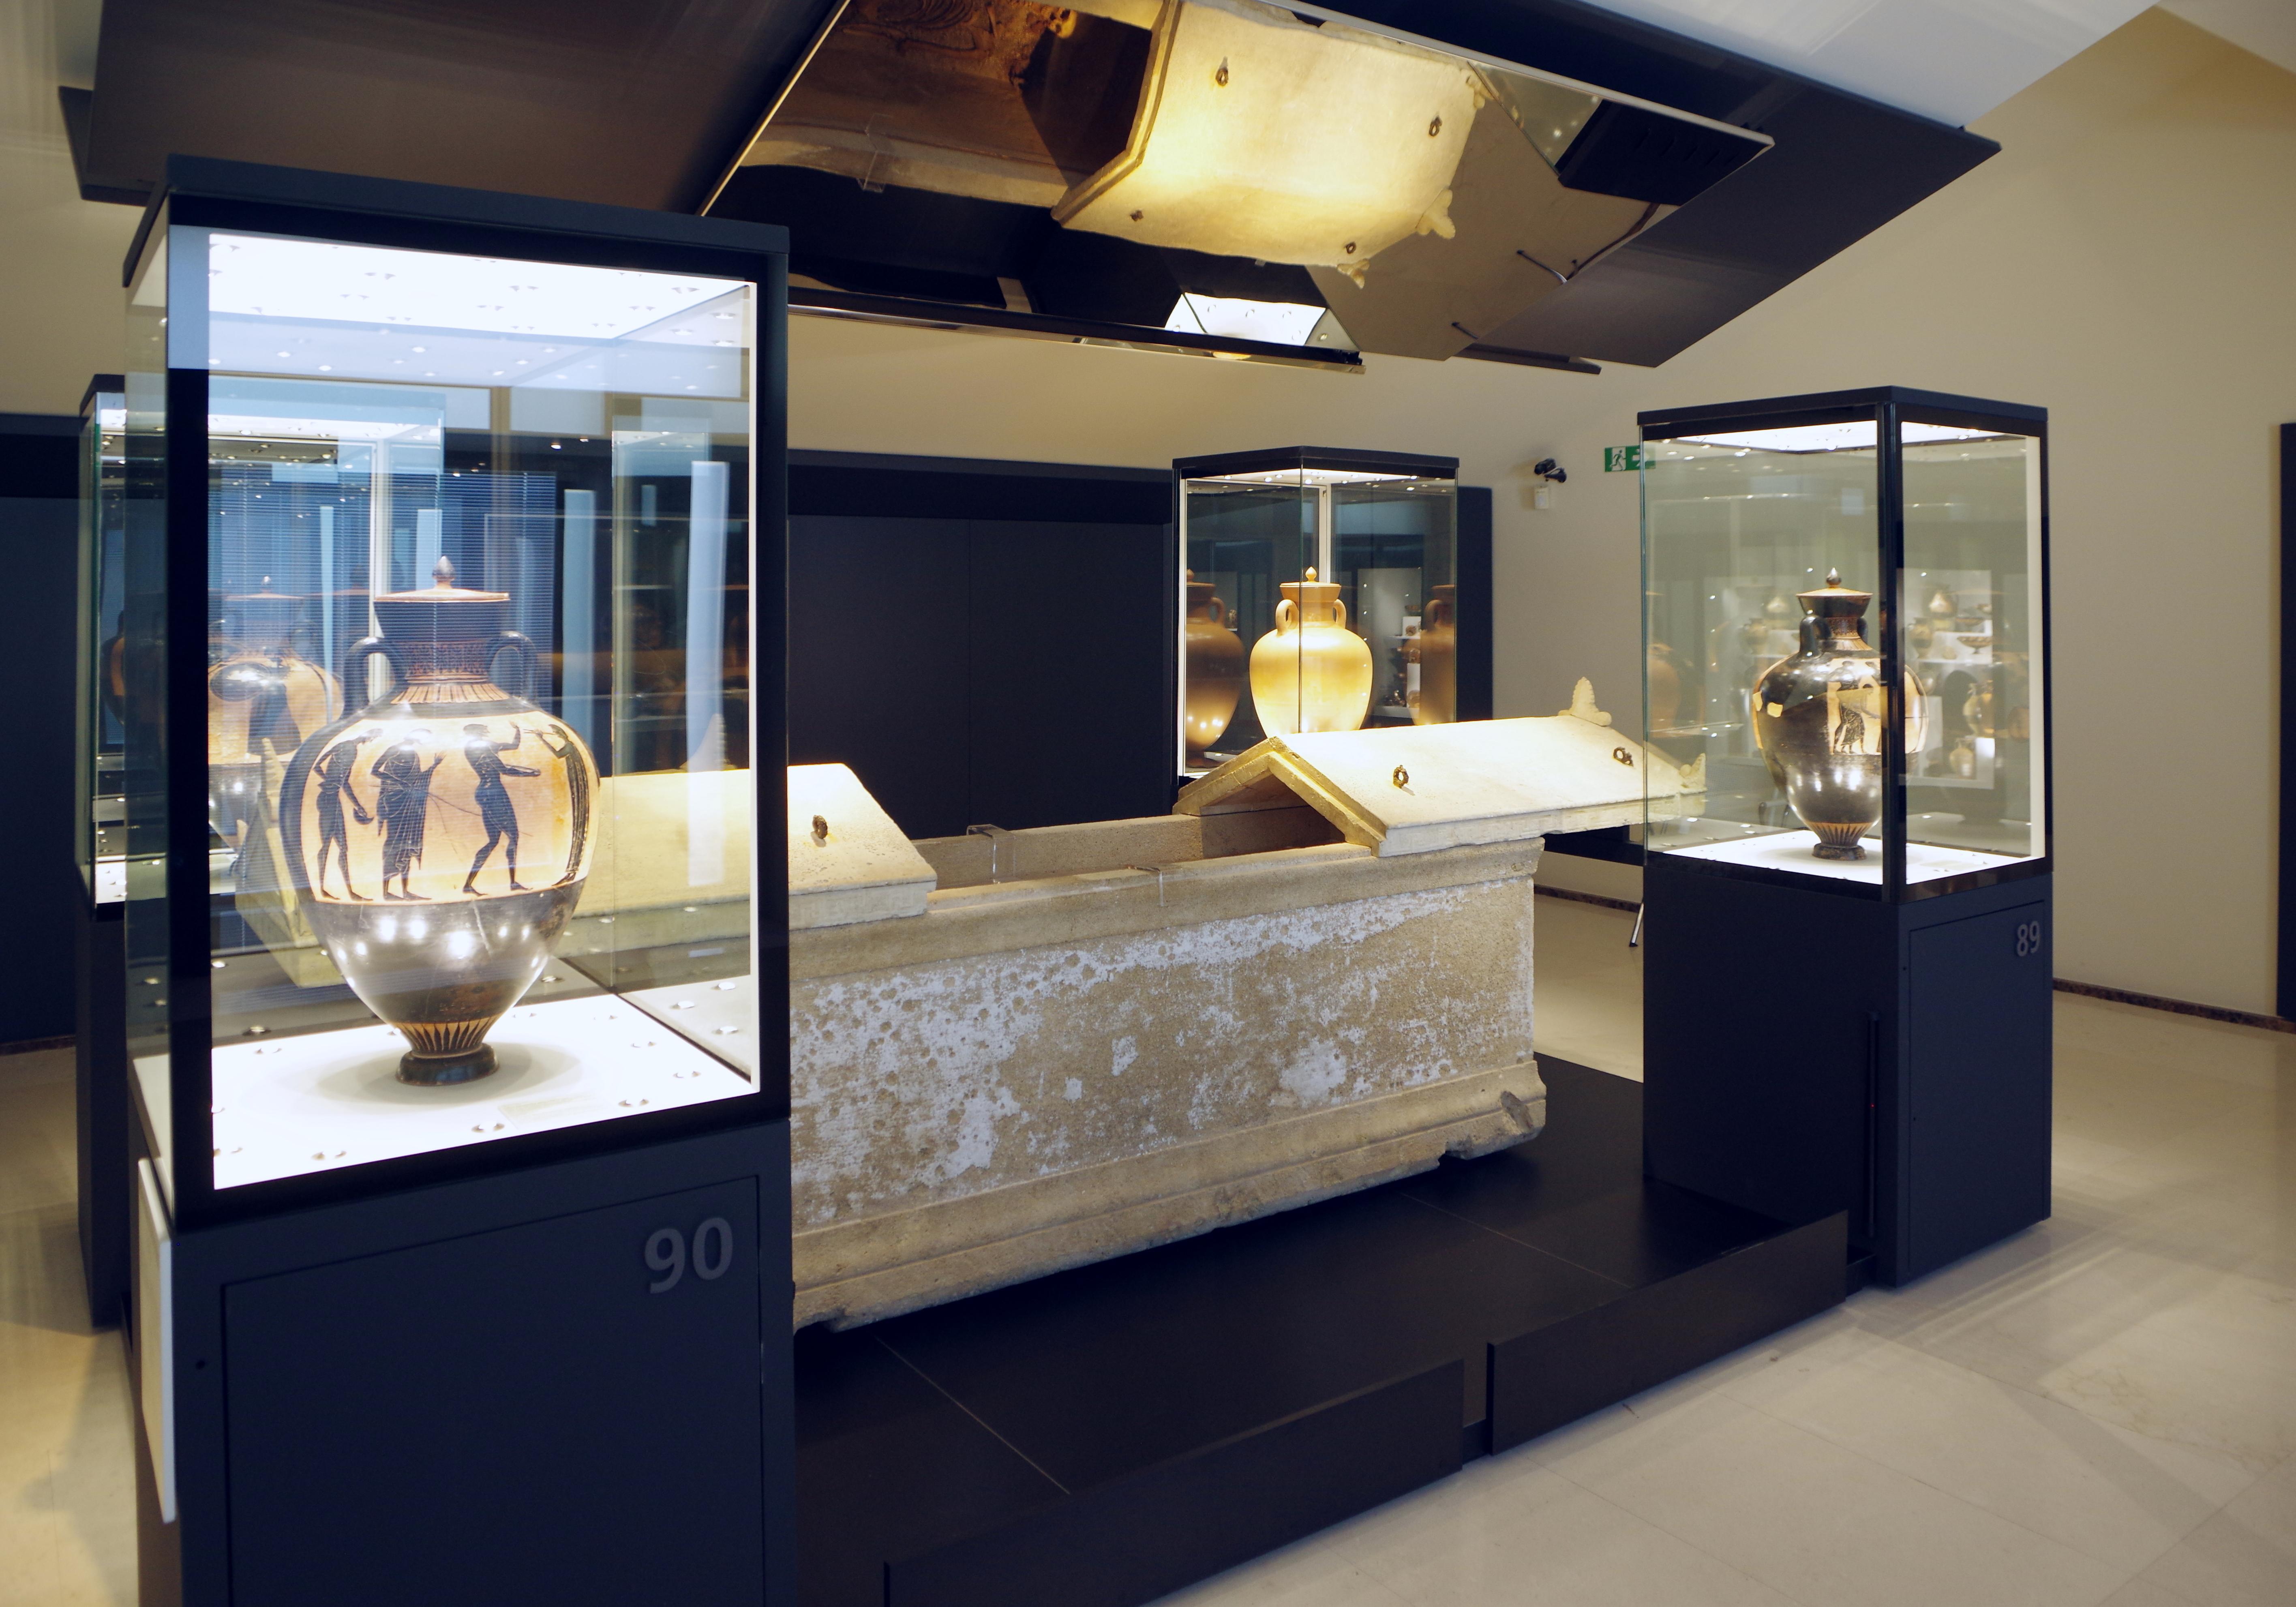 Museo archeologico di Taranto - photo credit: Berthold Werner